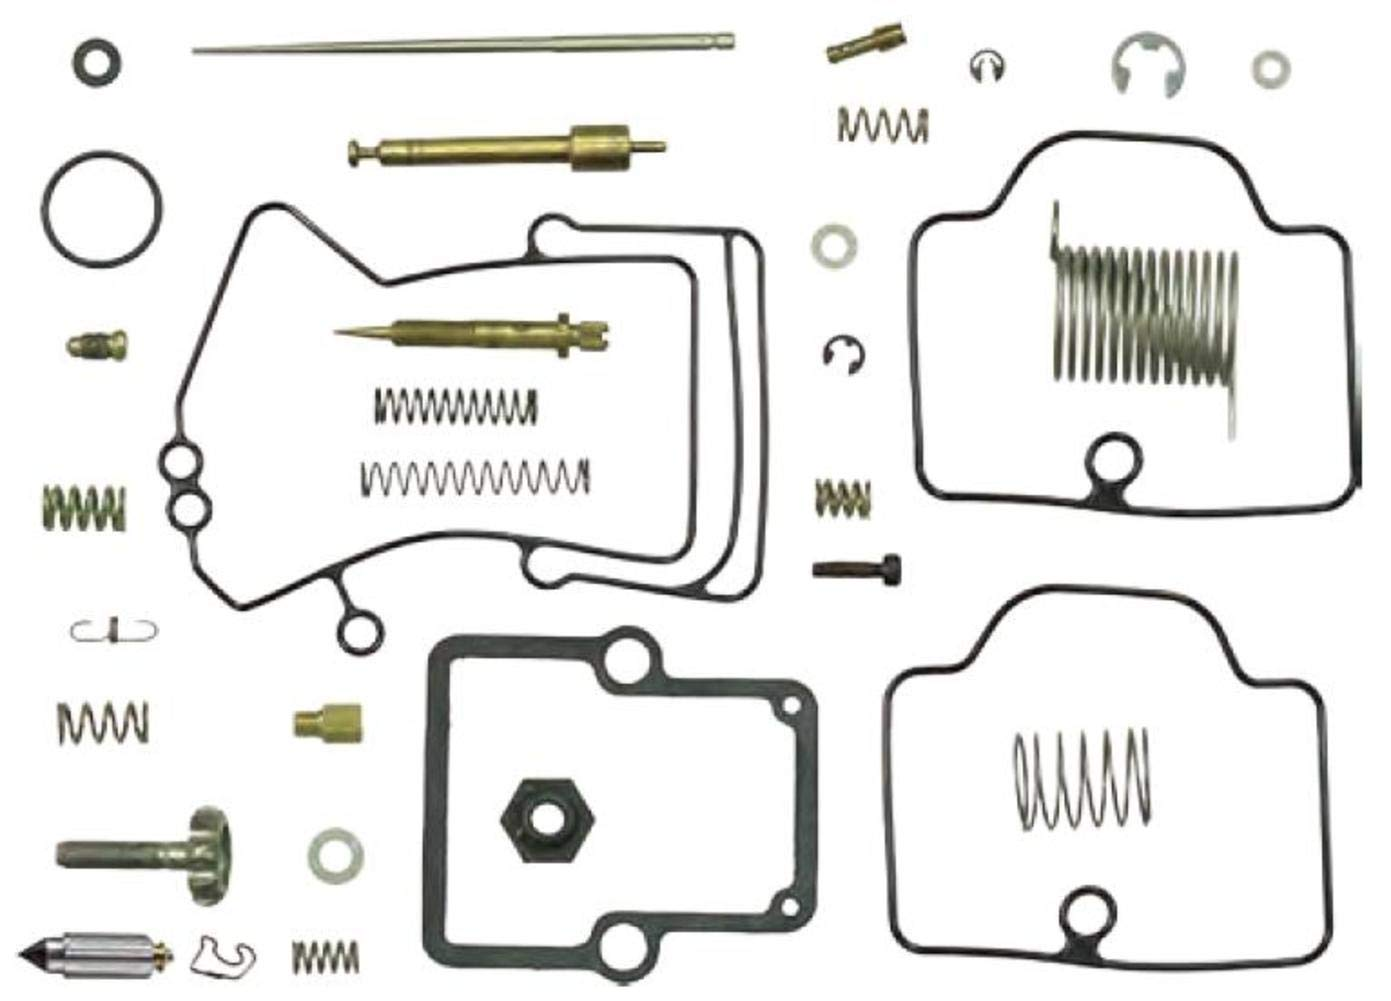 Sports Parts Inc Sm 07601 Carburetor Repair Kit Automotive 2010 Ski Doo Renegade Wiring Diagram